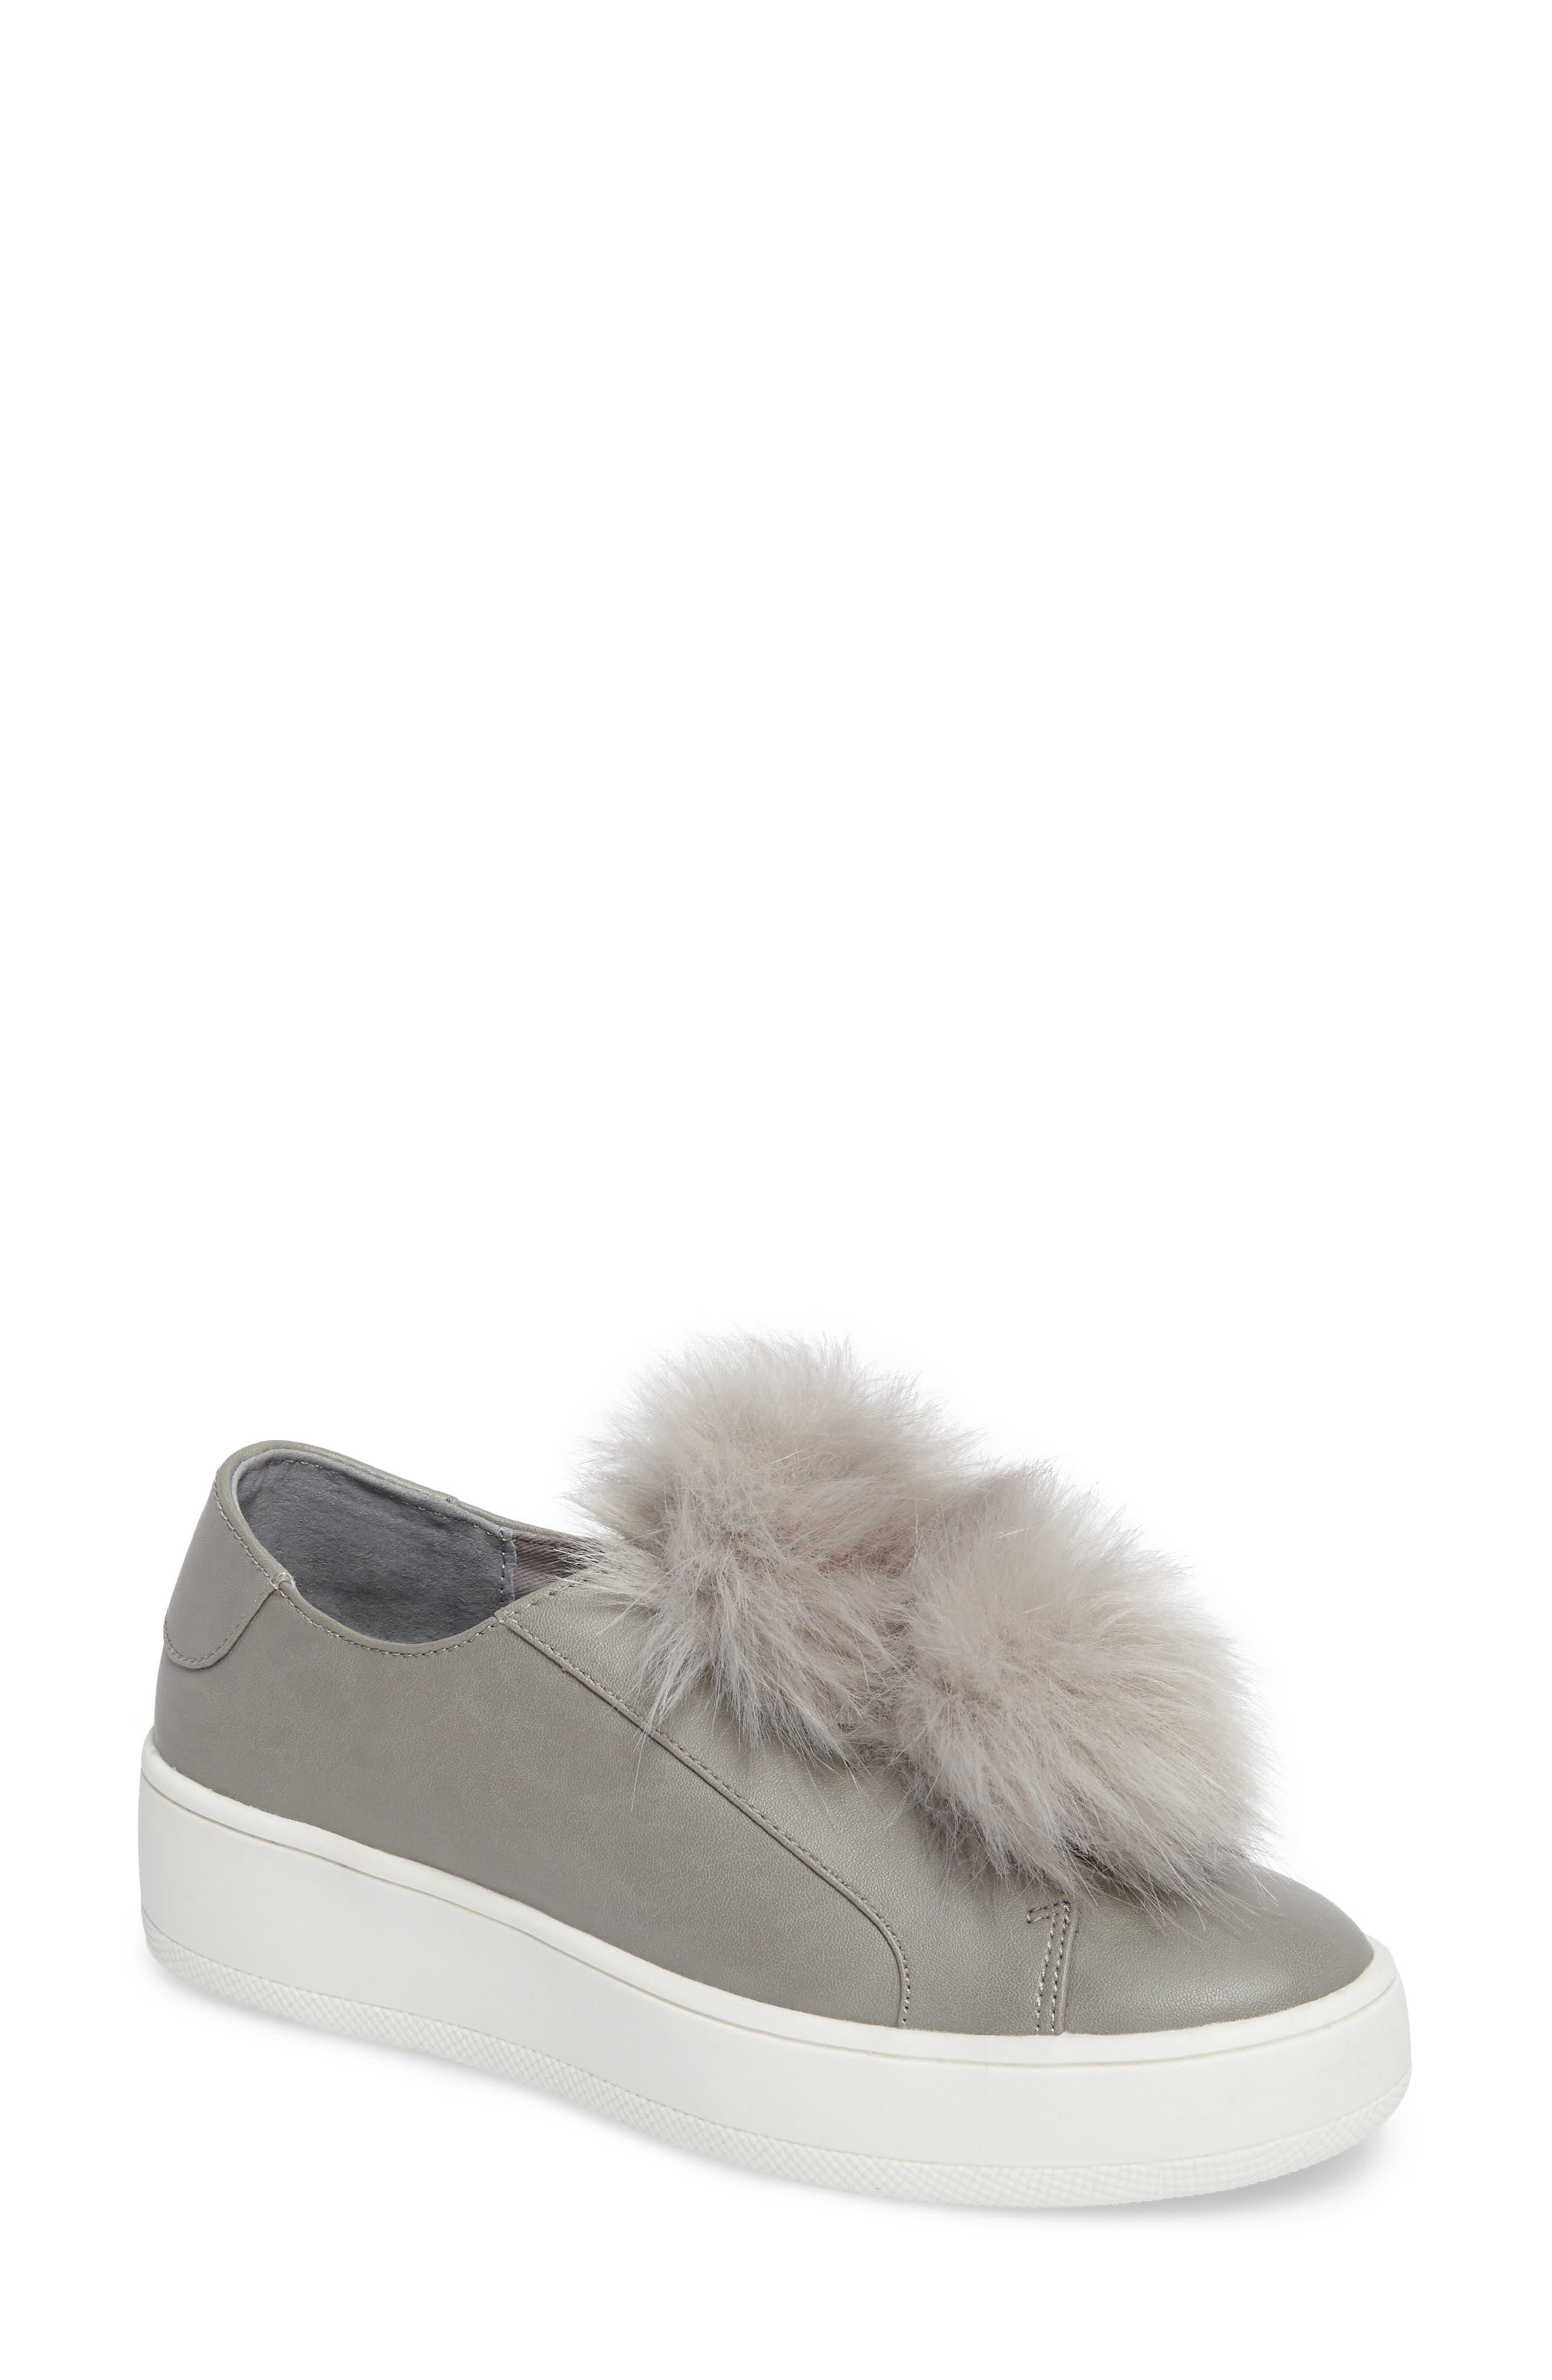 Breeze Faux Fur Pom Sneaker,                             Main thumbnail 1, color,                             Grey